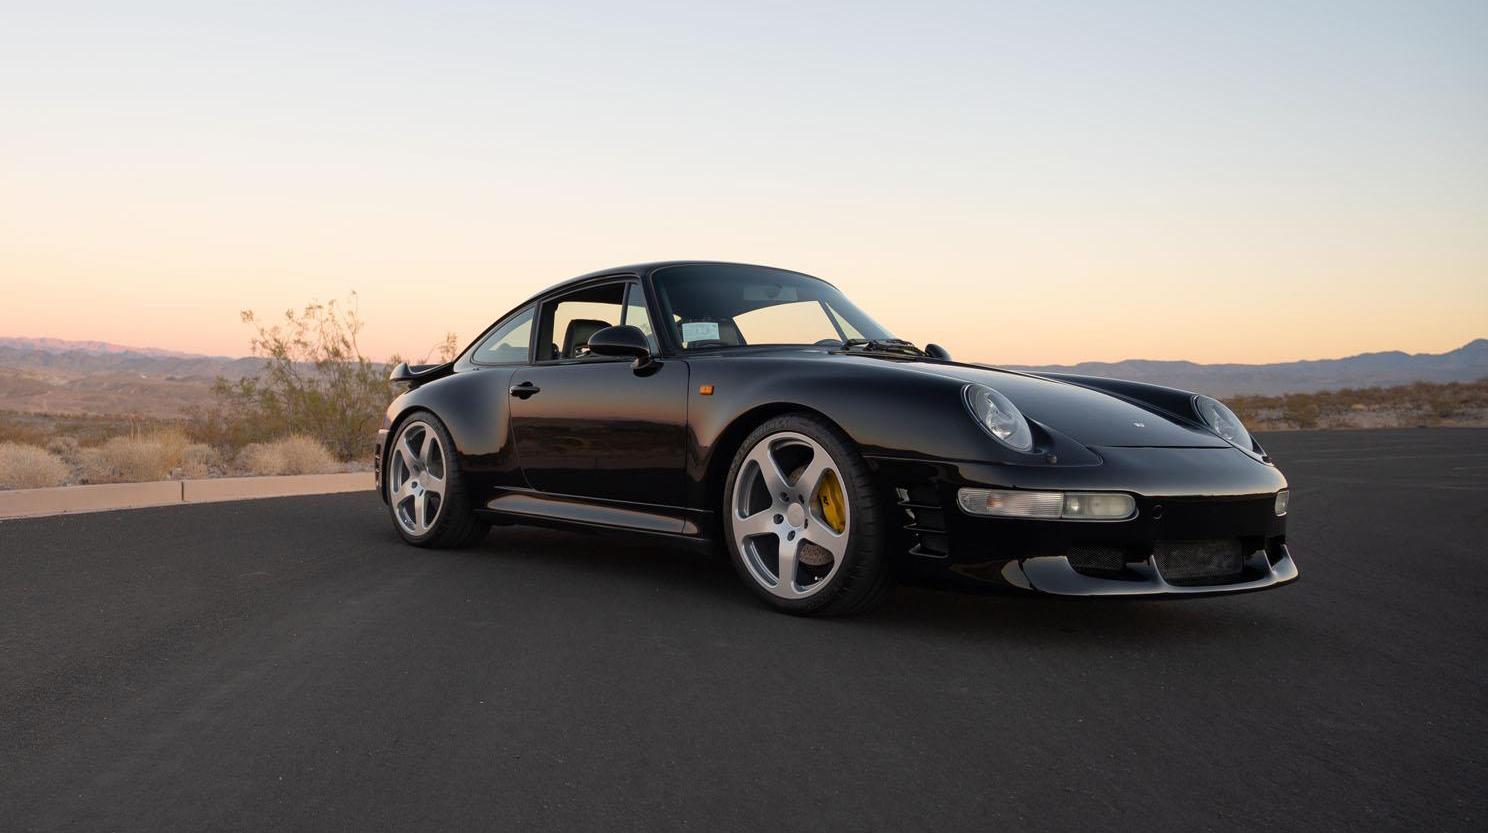 Porsche RUF Turbo R